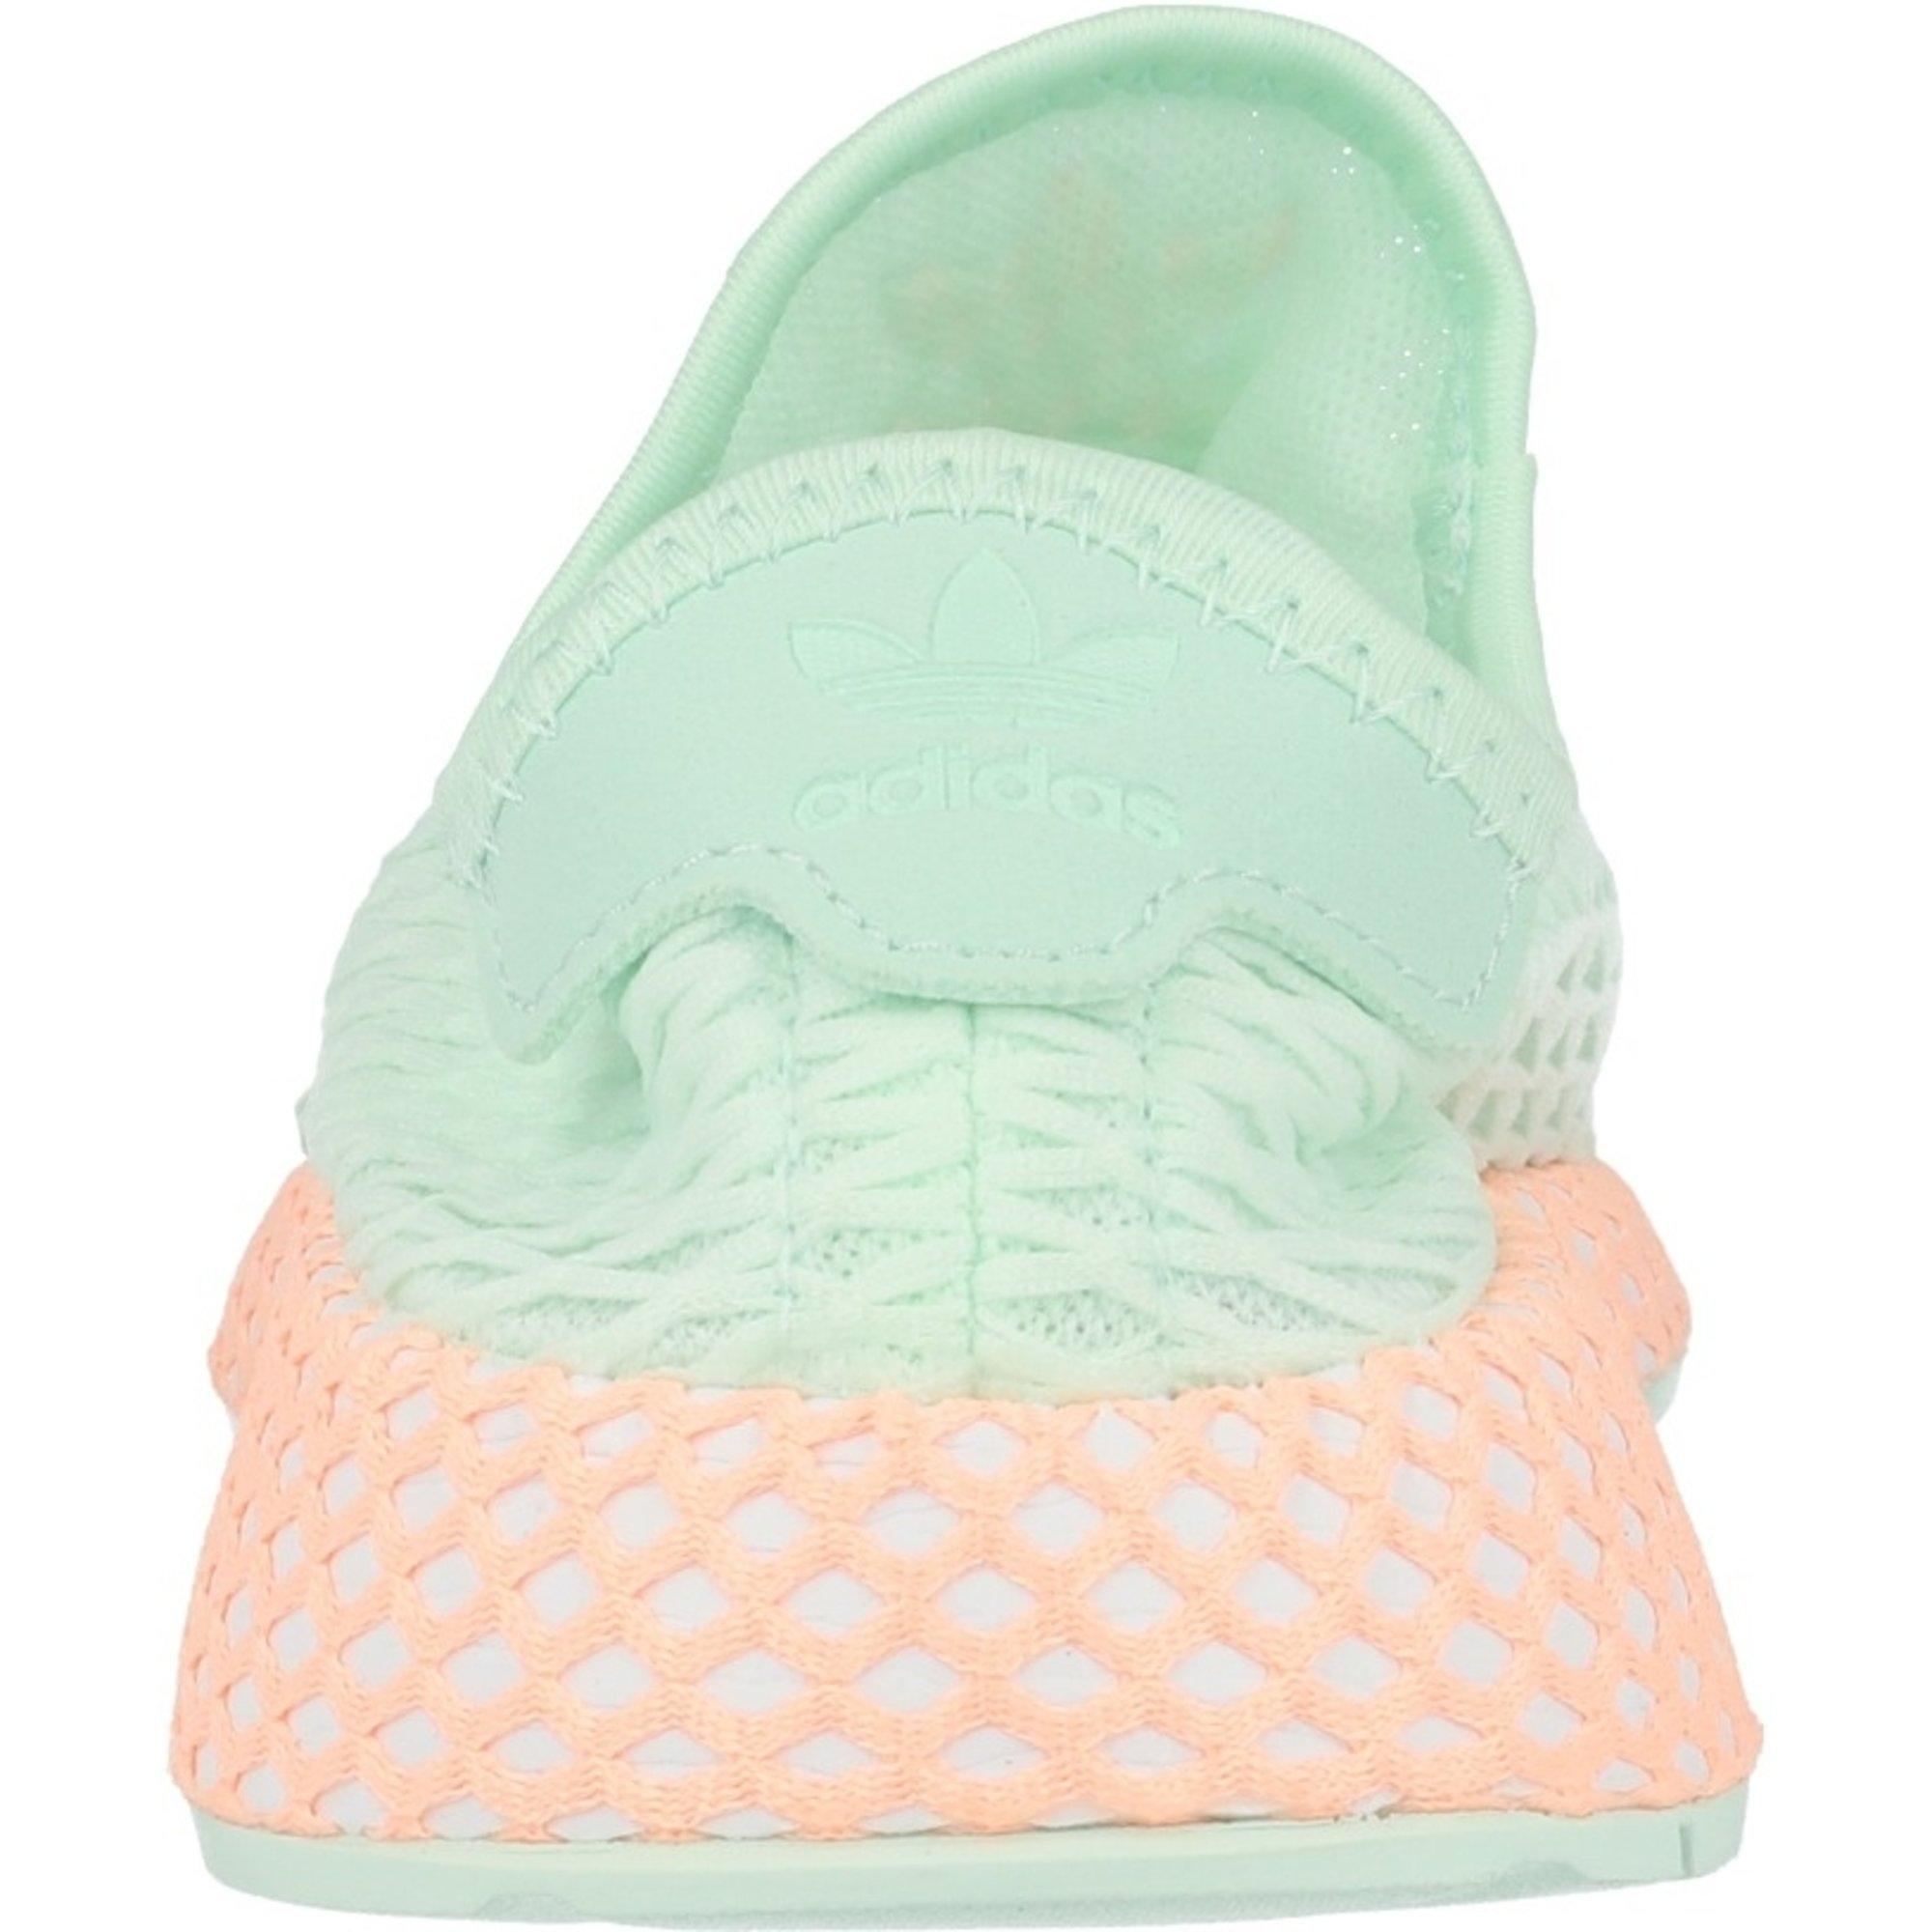 adidas deerupt ice mint